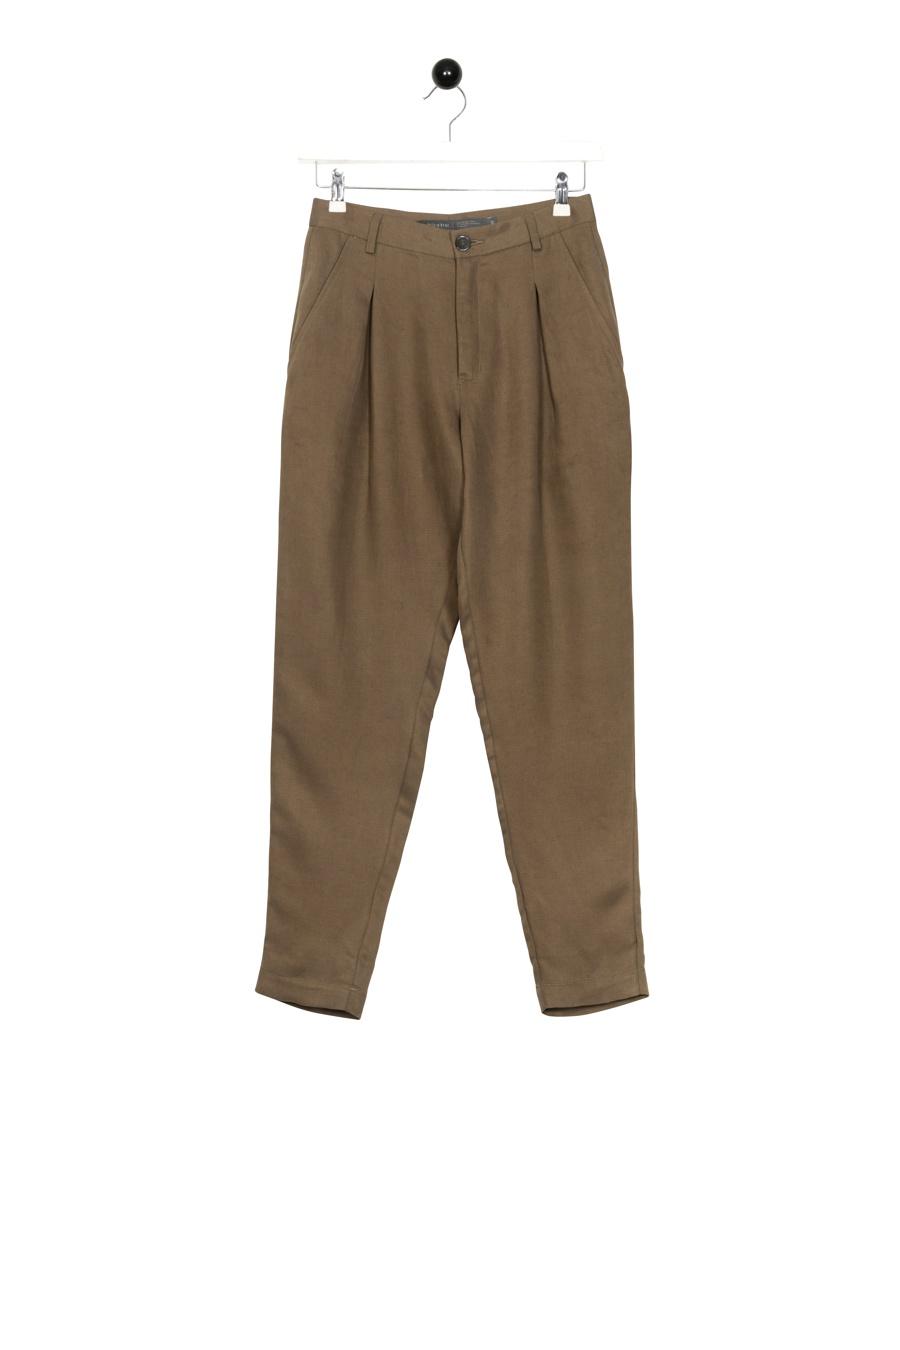 Årsta Trousers